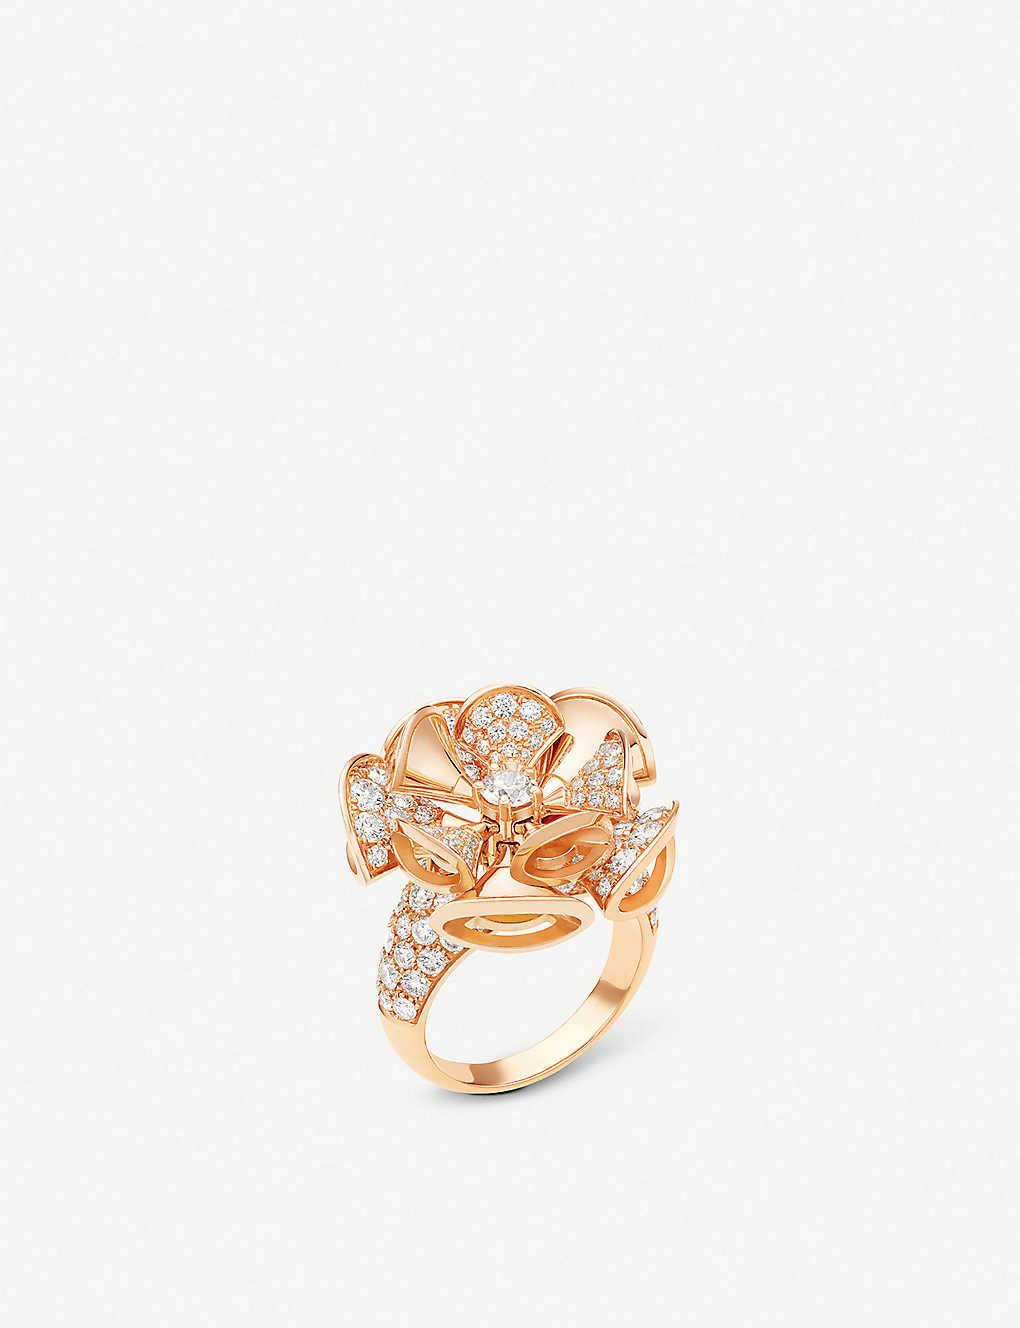 bvlgari divasu0027 dream 18kt pinkgold and diamond ring quick view wish list